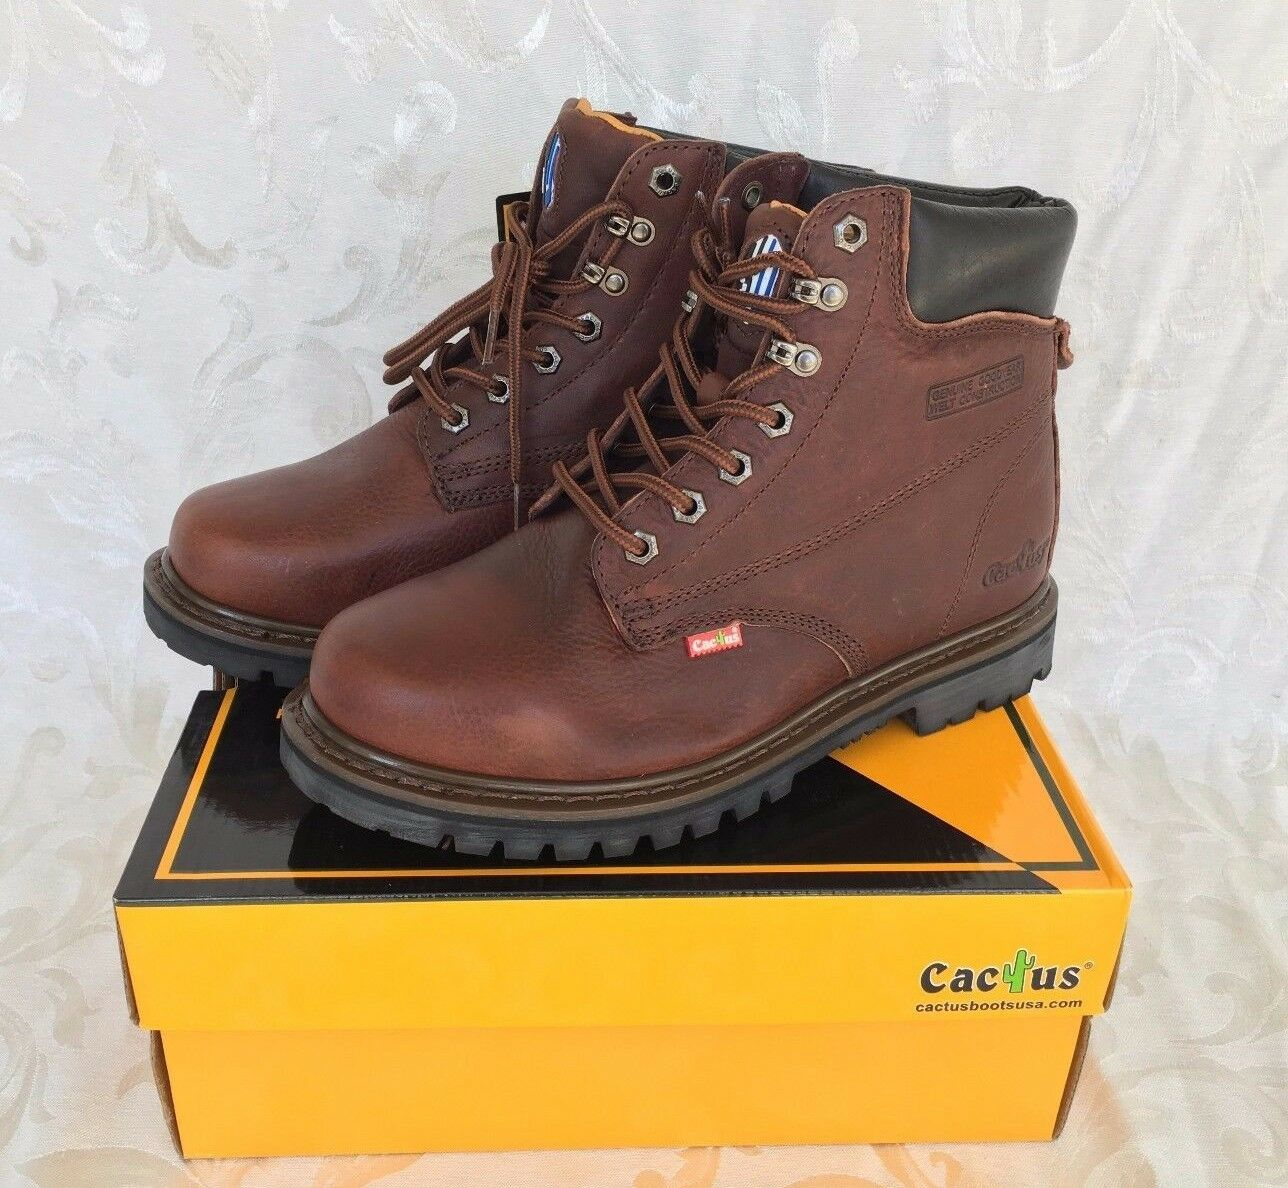 Cactus Men Dark Brown 6  Leather Work Boots Oil Resistant 627 Sizes Comfort Fit